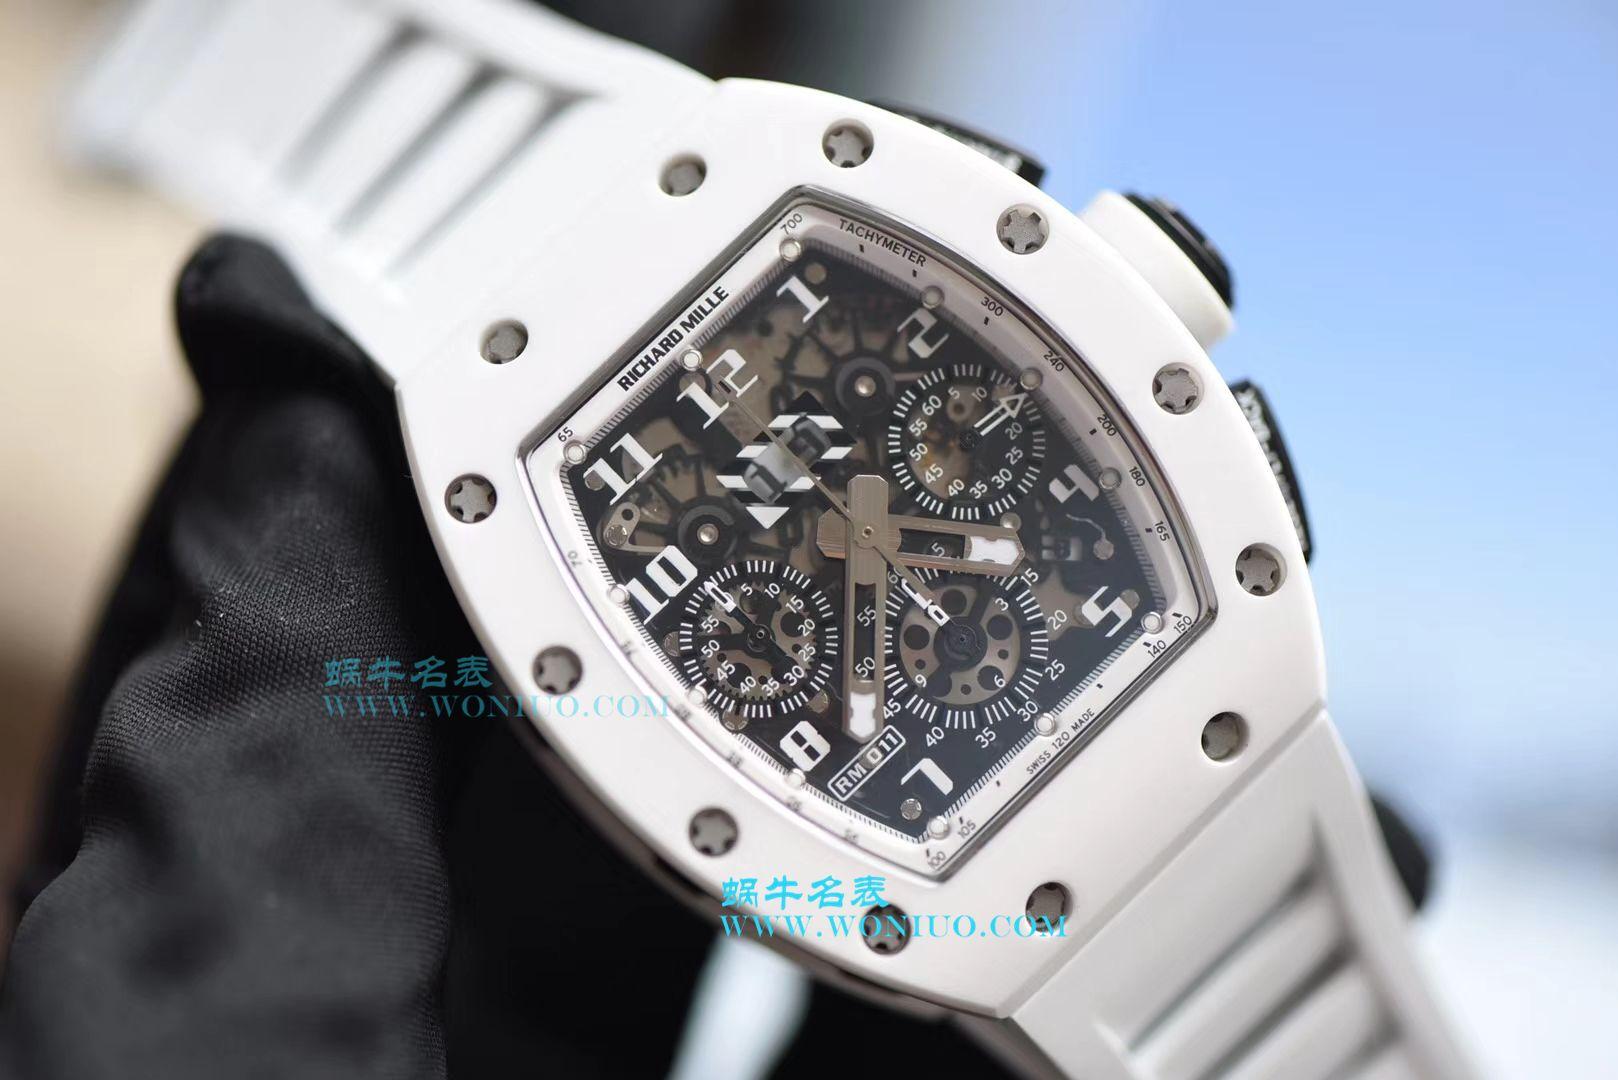 【KV厂一比一超A高仿手表】理查德米尔RICHARD MILLE男士系列RM011 白陶瓷多功能腕表 / RM 011G